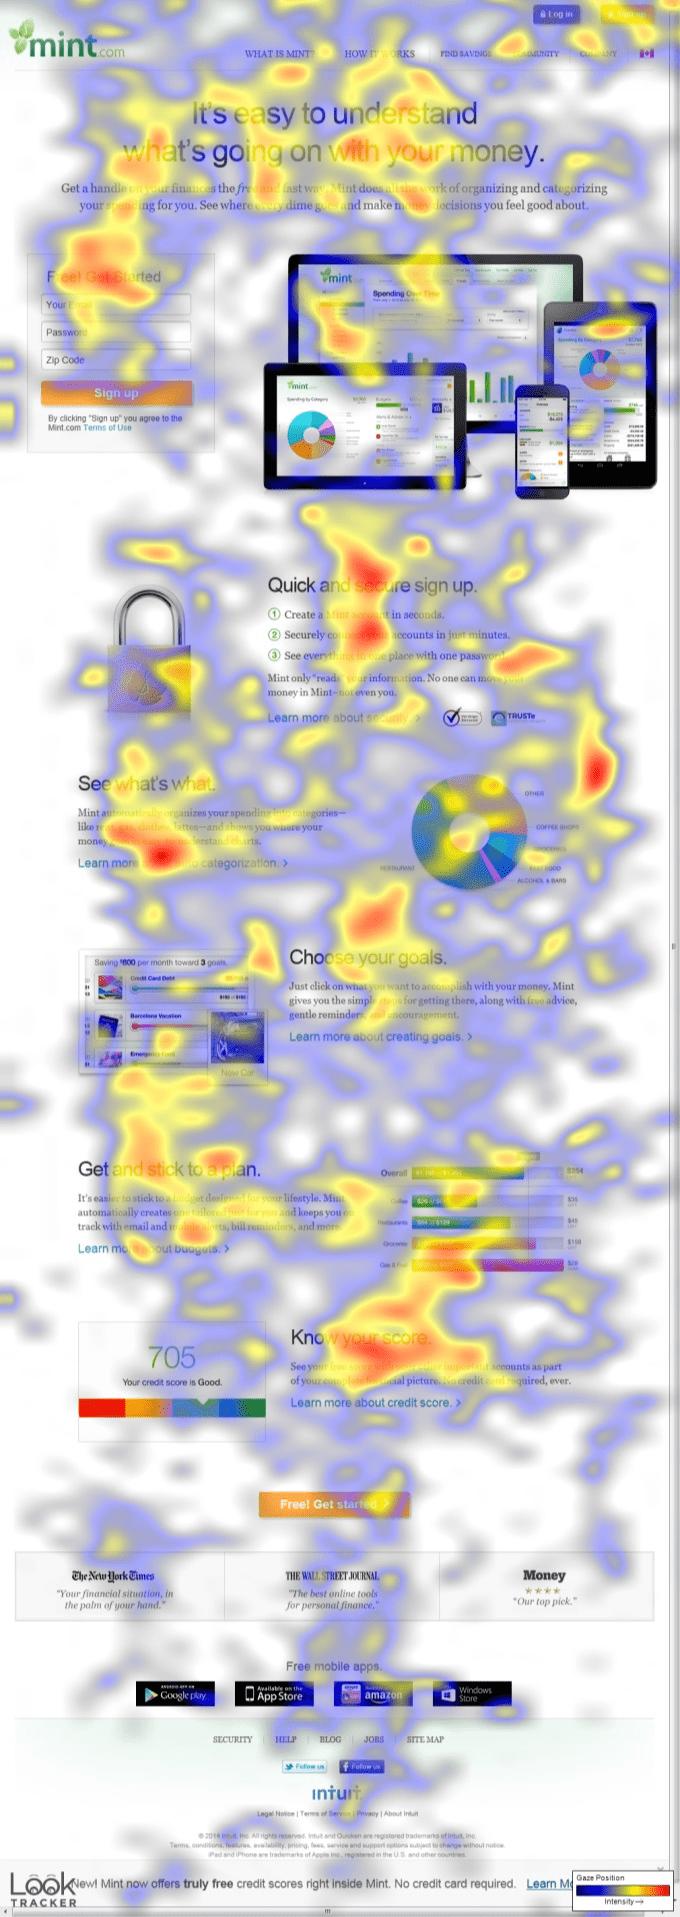 Mint.com-Eye-Tracking-Analysis